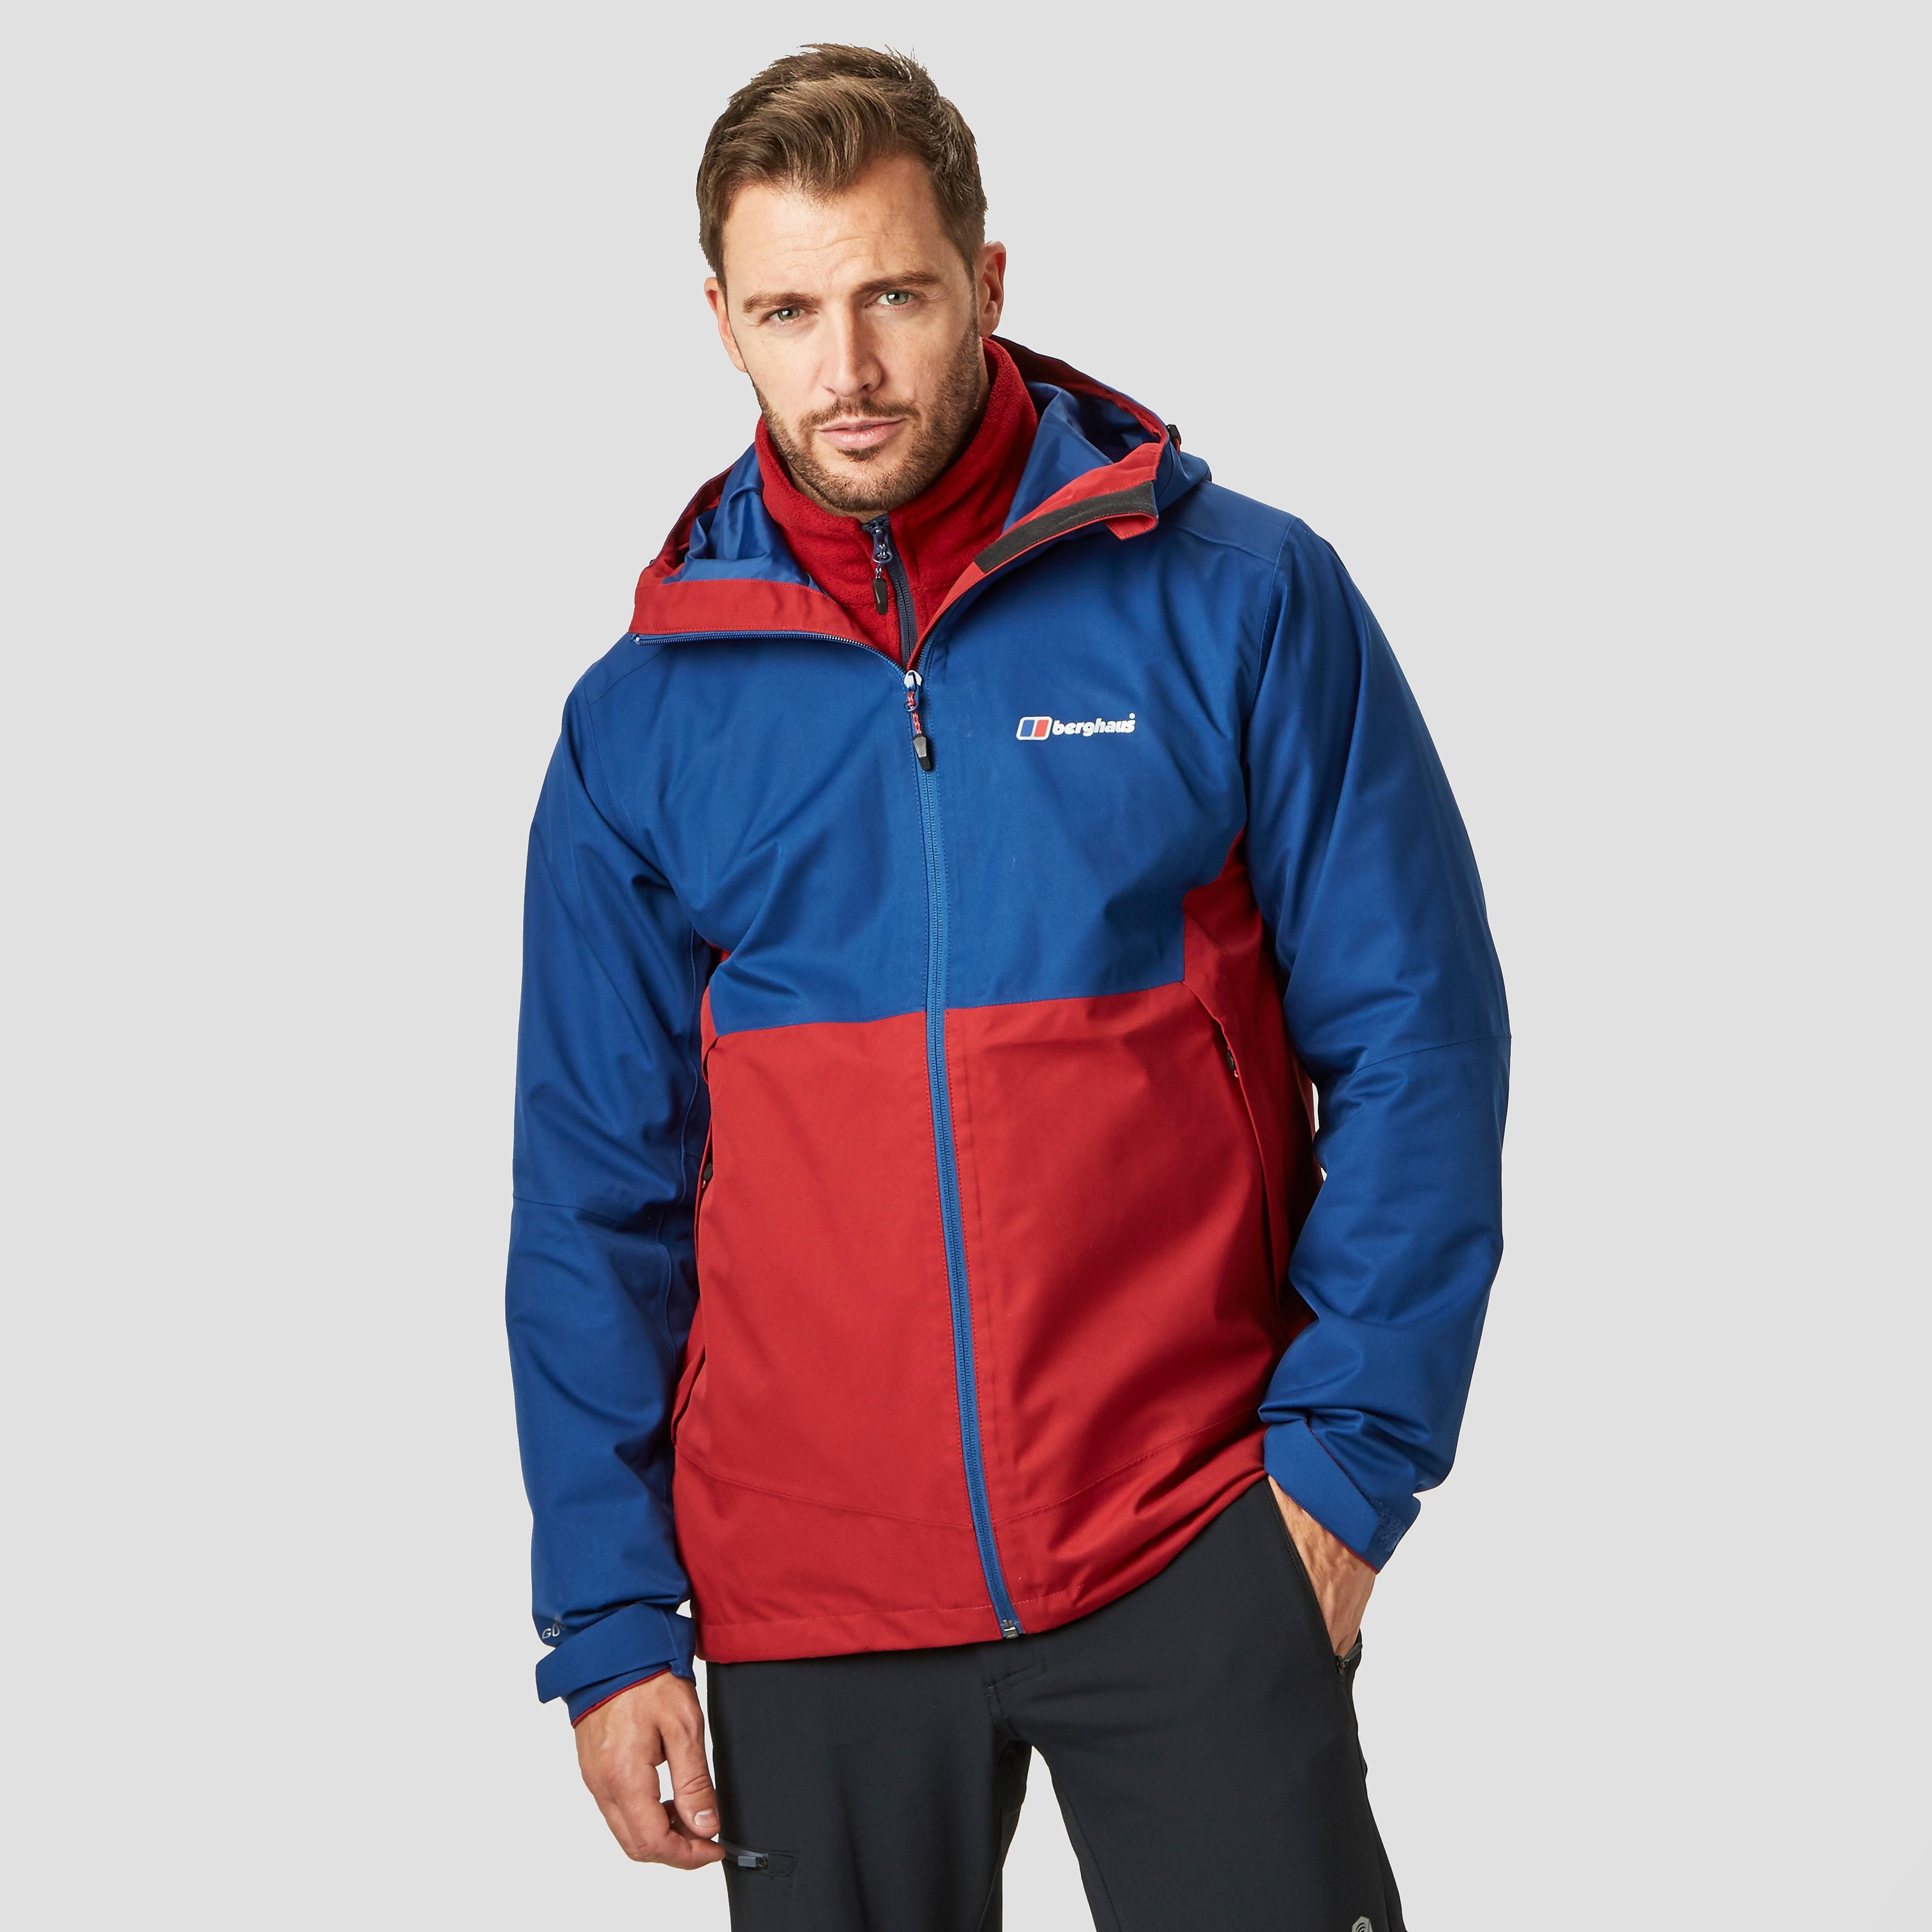 Berghaus Men's Fellmaster Jacket